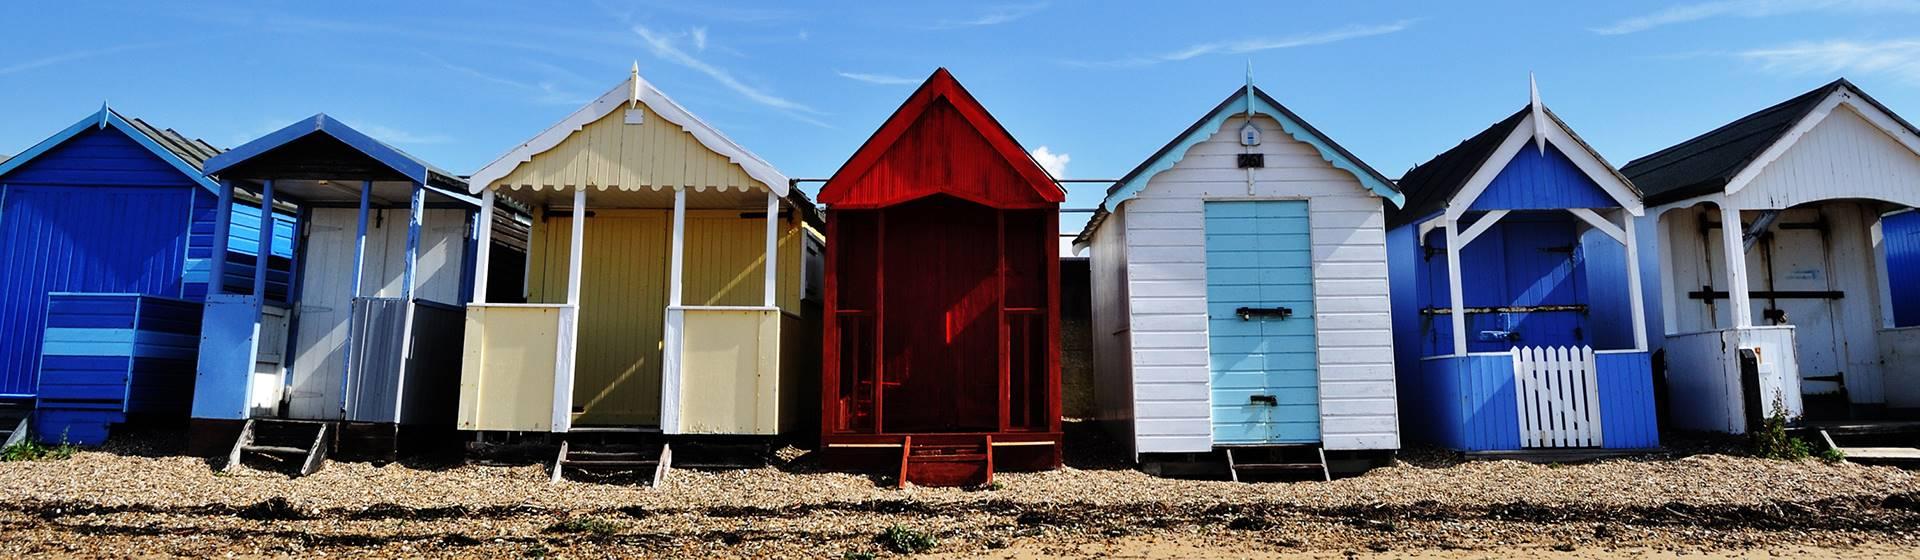 Southend on Sea feat the Essex Sunshine Coast